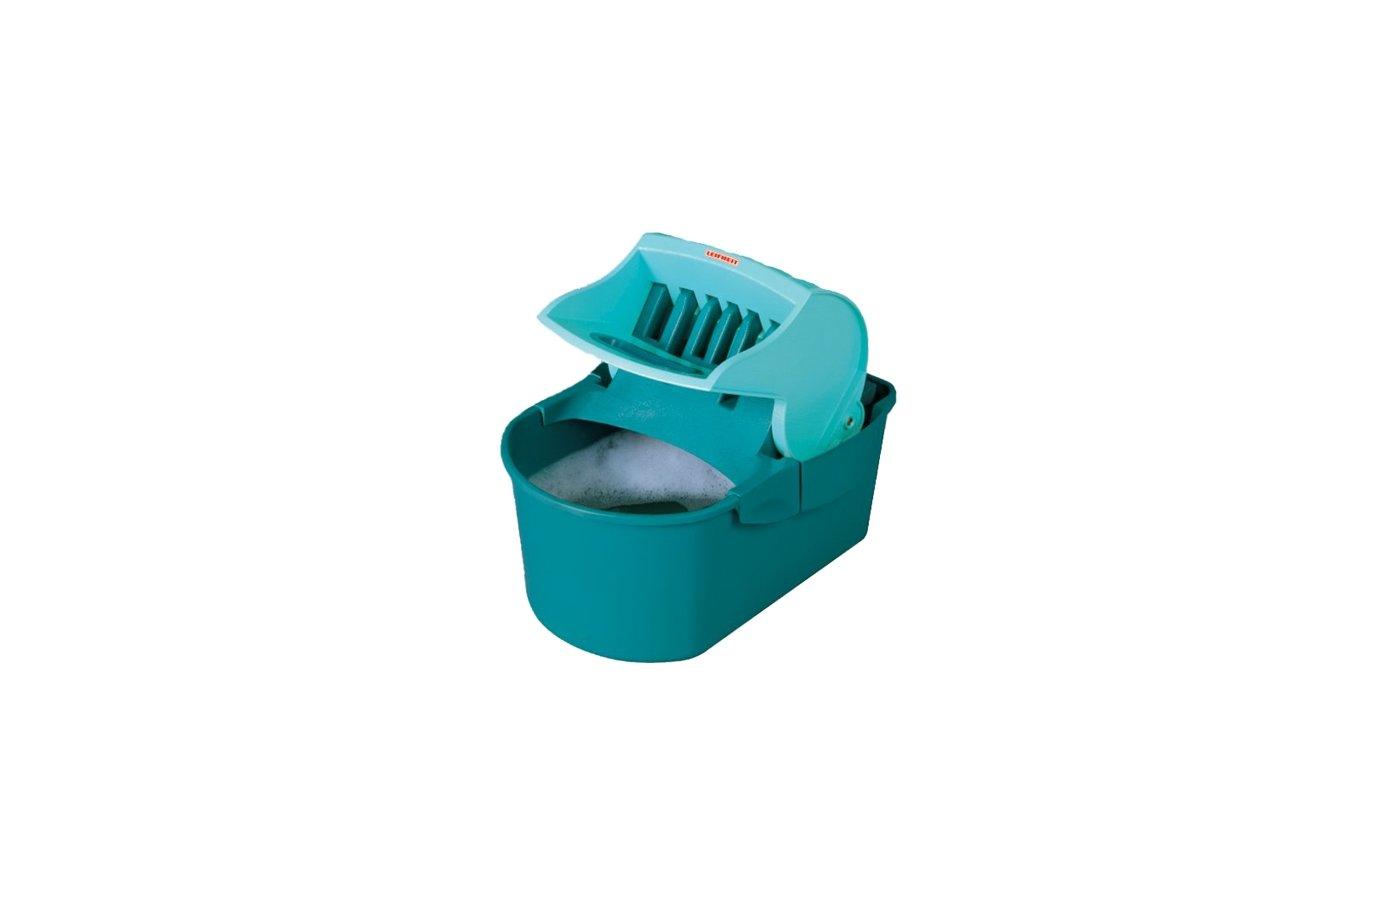 Инвентарь для уборки LEIFHEIT Убор PERFECT Ведро д/мытья полов с отжим55080